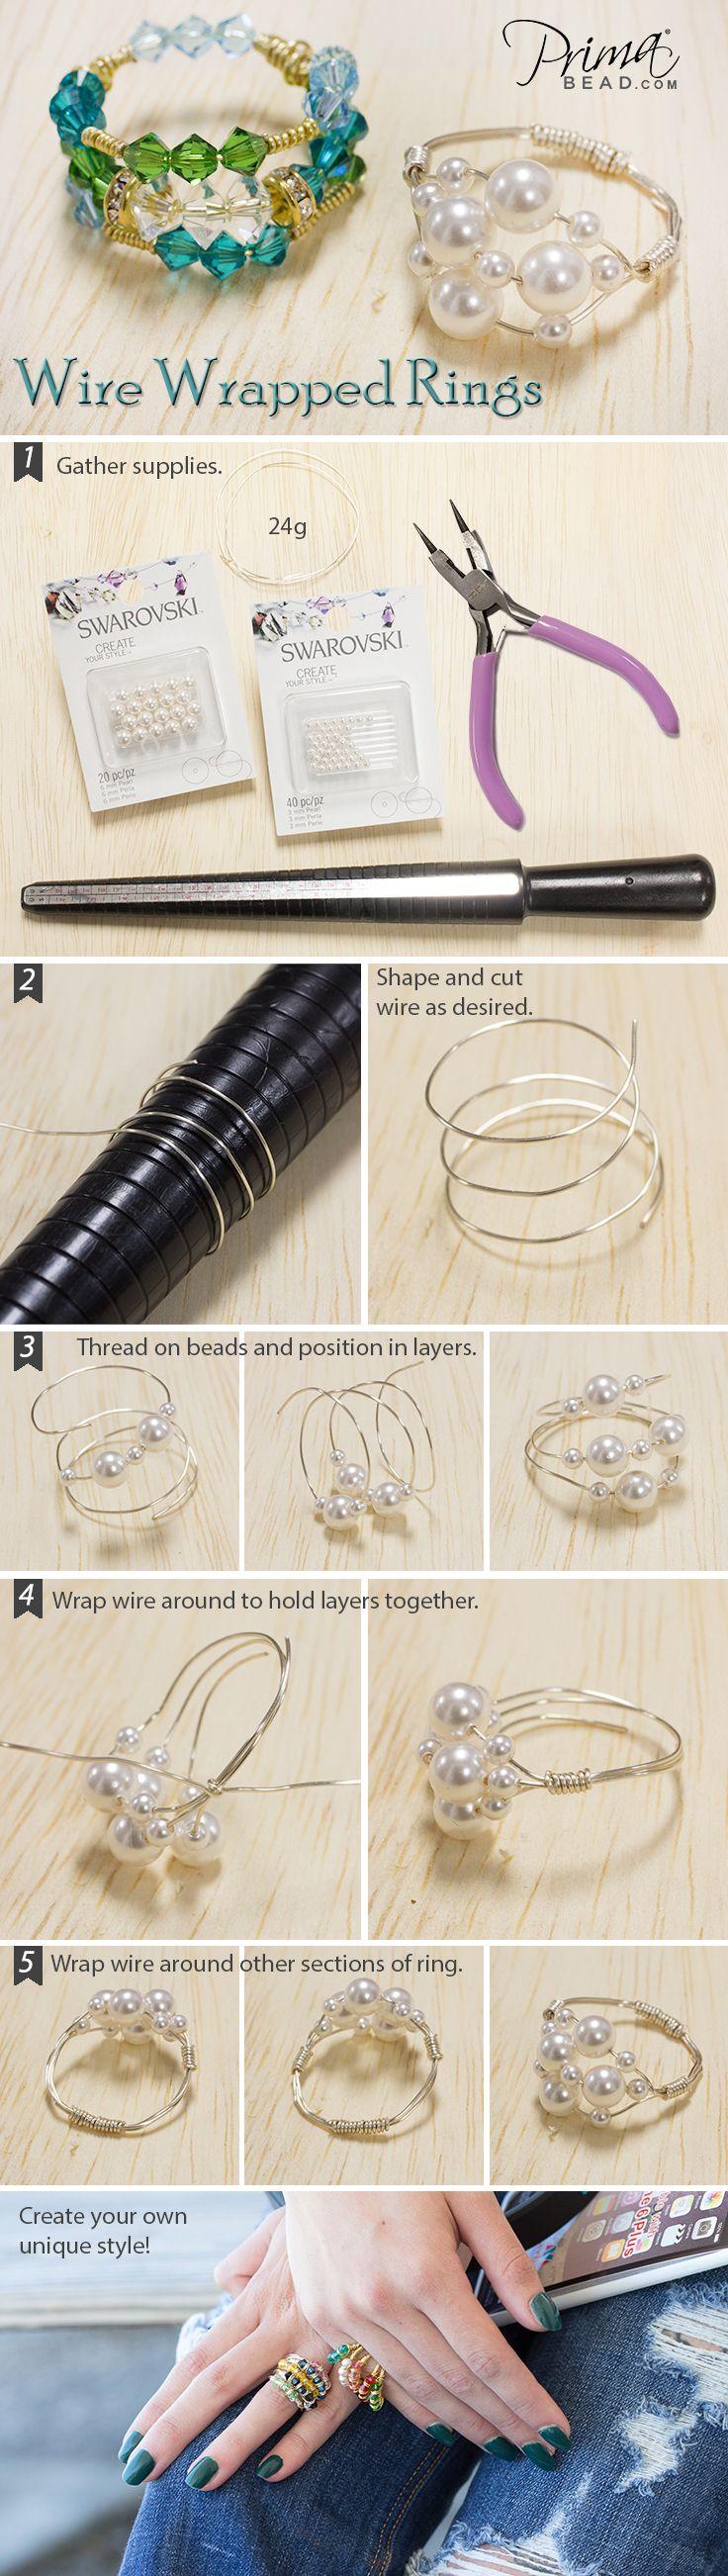 Anleitung Draht Ring mit Perlen biegen / Wire Wrapped Rings